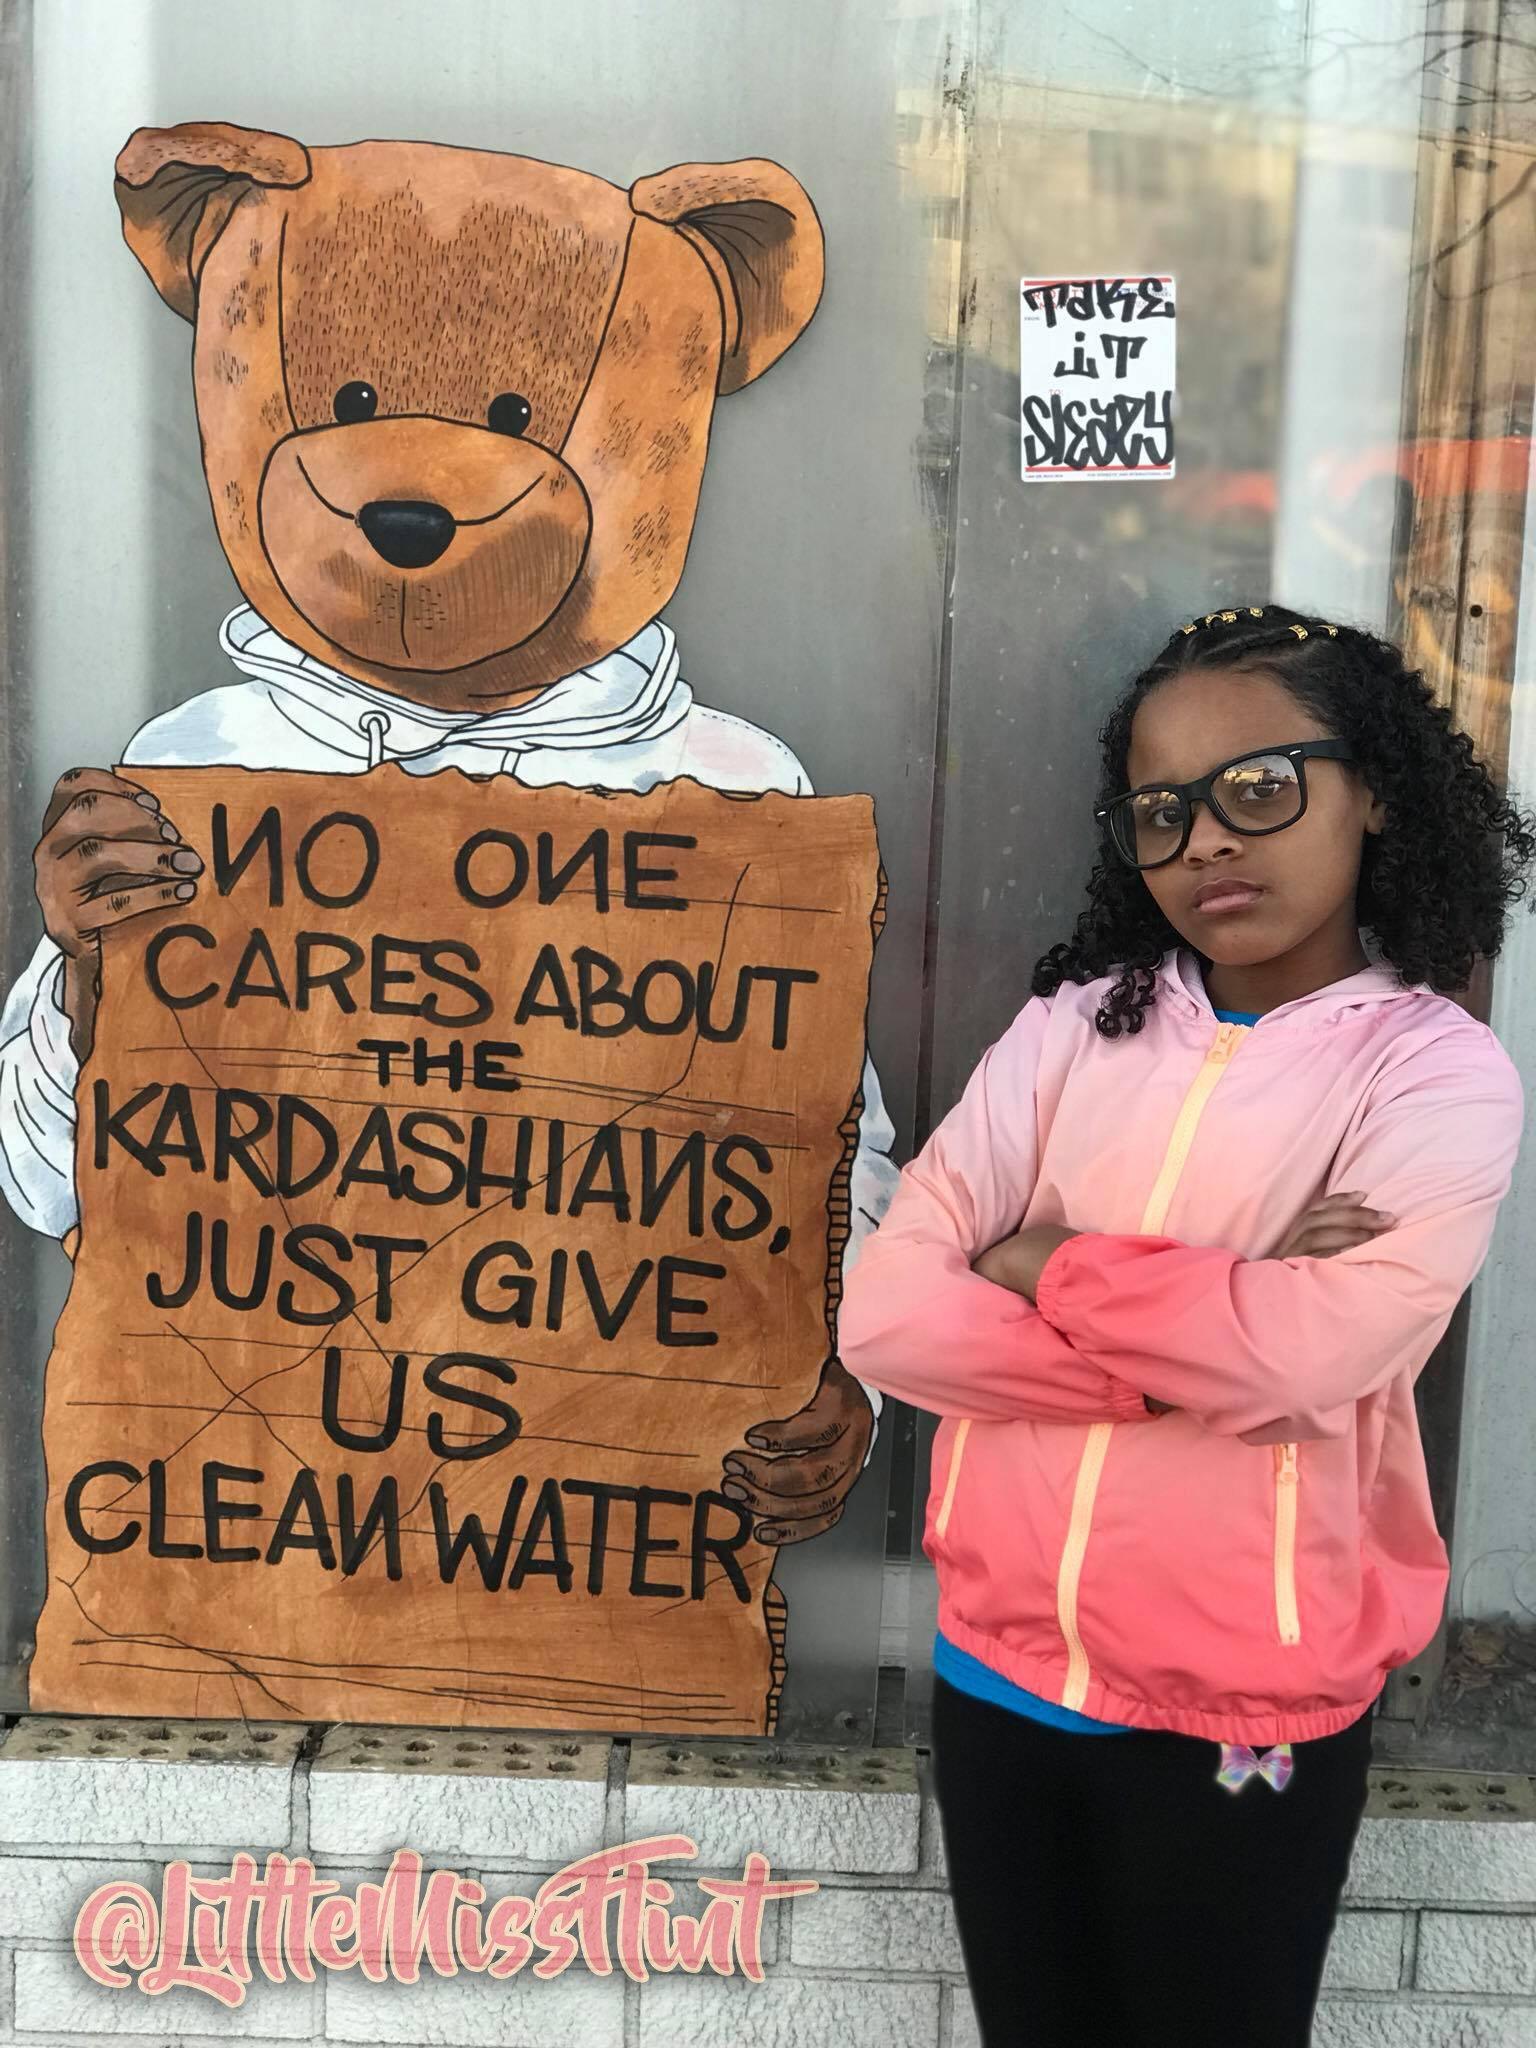 #JusticeForFlint  #FlintWaterCrisis https://t.co/UTAbG4CtV8